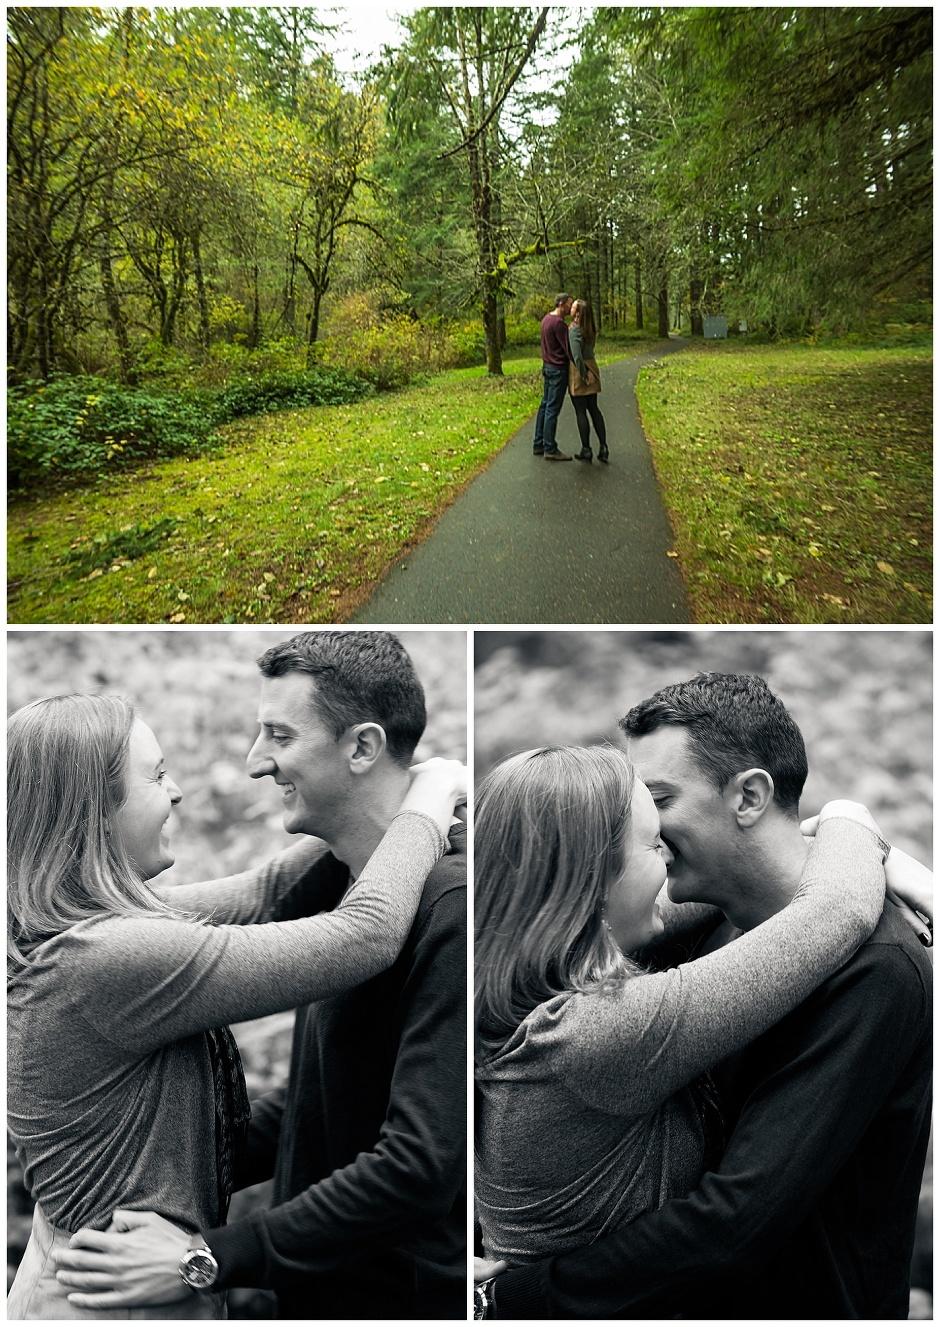 Silver Falls State Park Engagement Shoot // Pacific Northwest Photography // Natalie & Scott // Stevi Sayler Photography